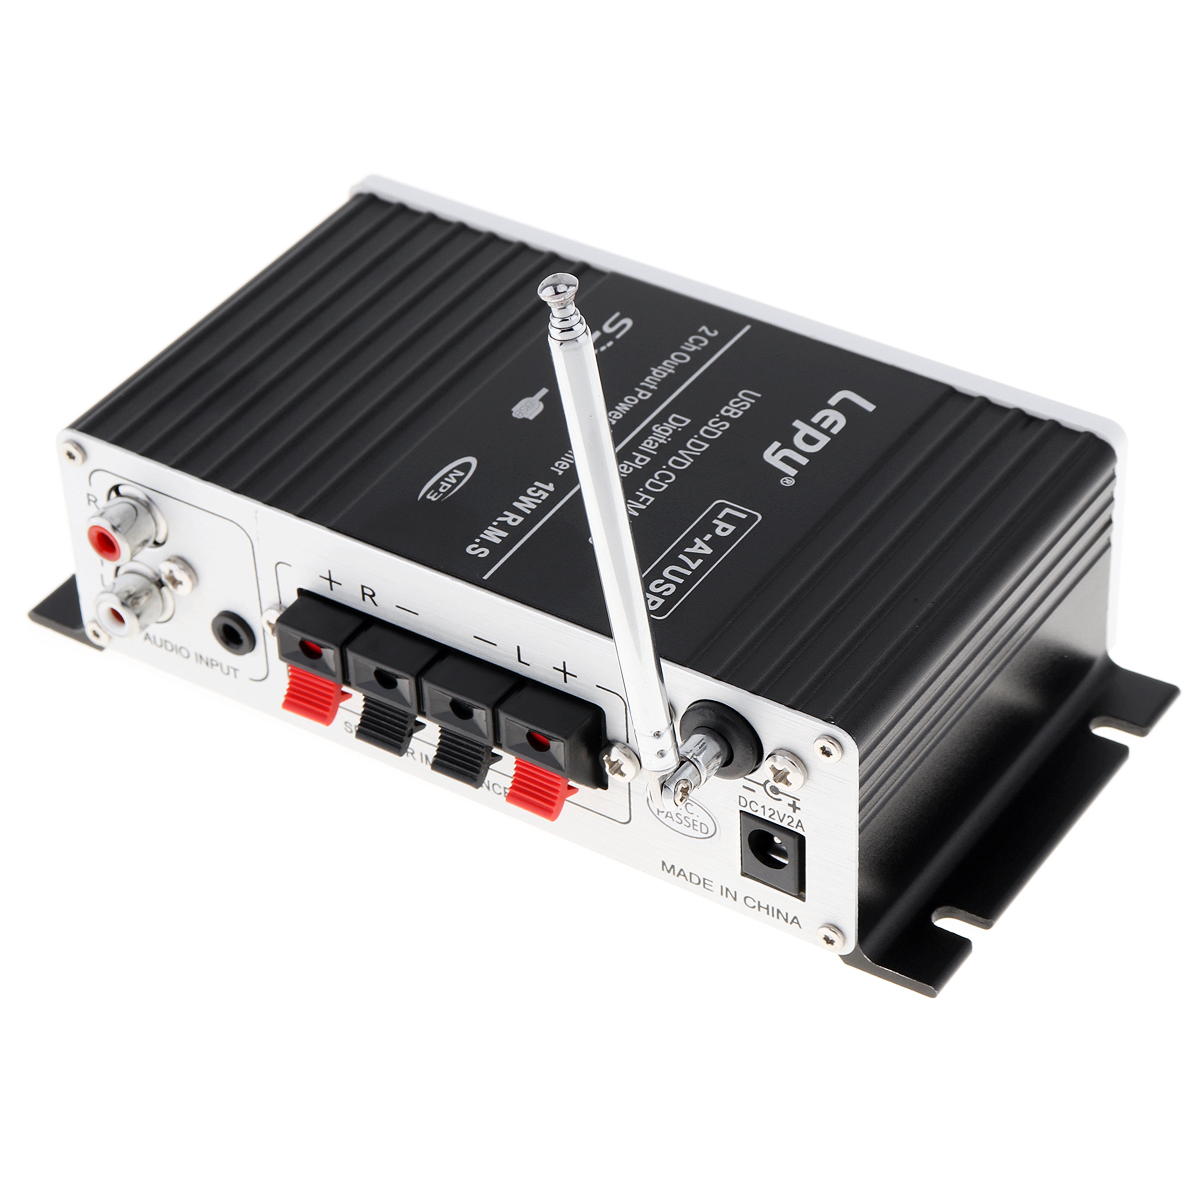 LEPY-Bluetooth-Mini-Power-Audio-Amplifier-Hi-Fi-AMP-MP3-FM-USB-SD-AUX-Car-Home thumbnail 12